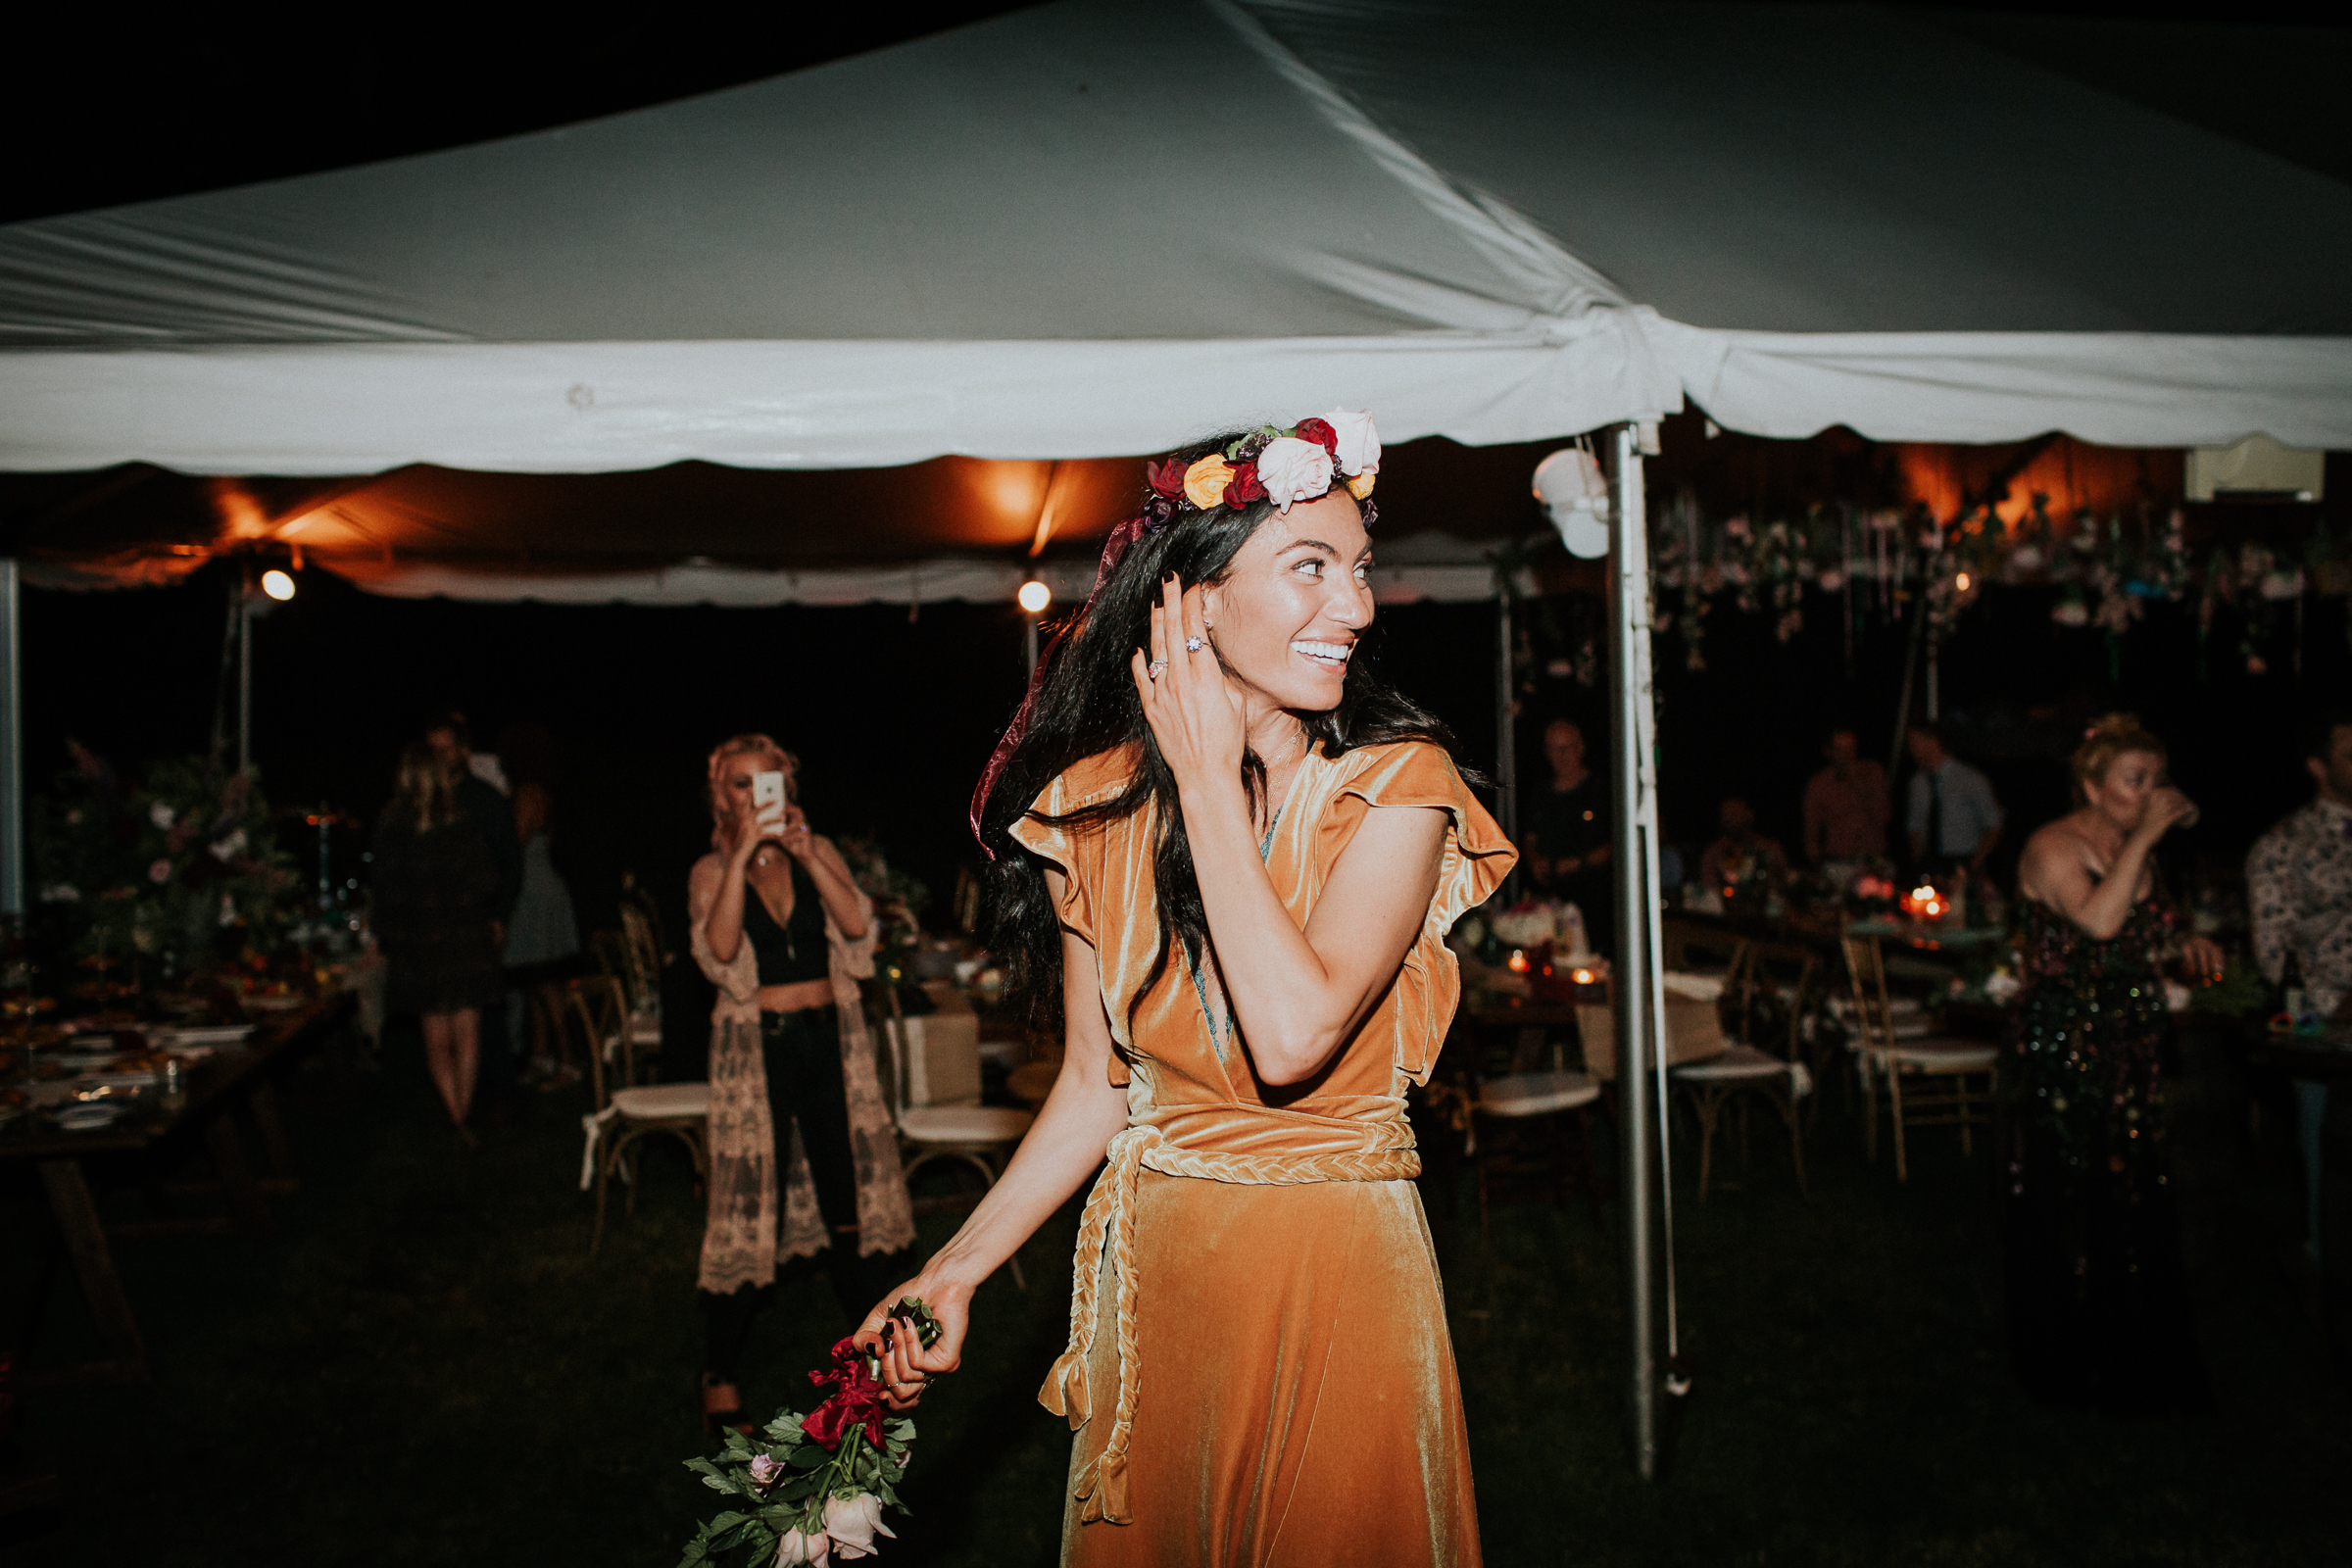 Backyard-Intimate-Adventurous-Destination-Wedding-Darien-Connecticut-Documentary-Wedding-Photography-138.jpg